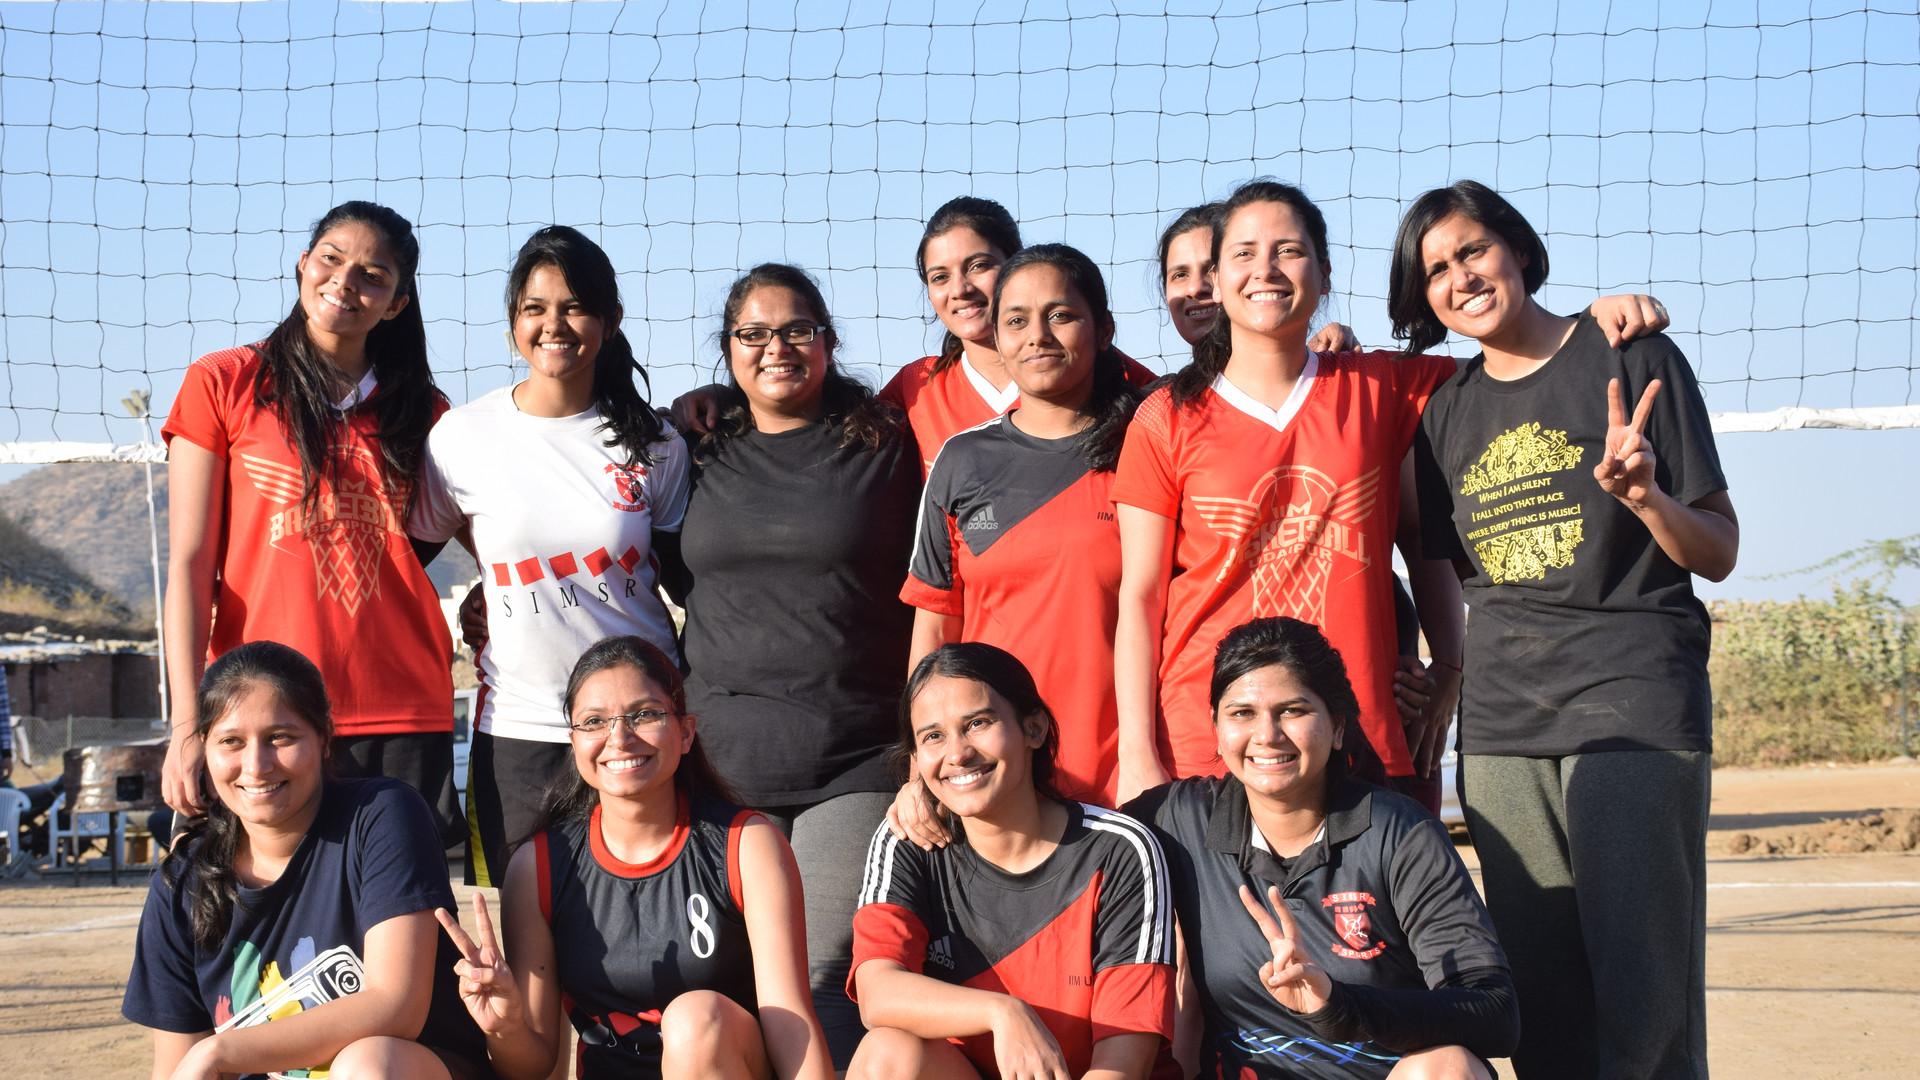 IIMU_UDAIPUR_Handball_girlsteam